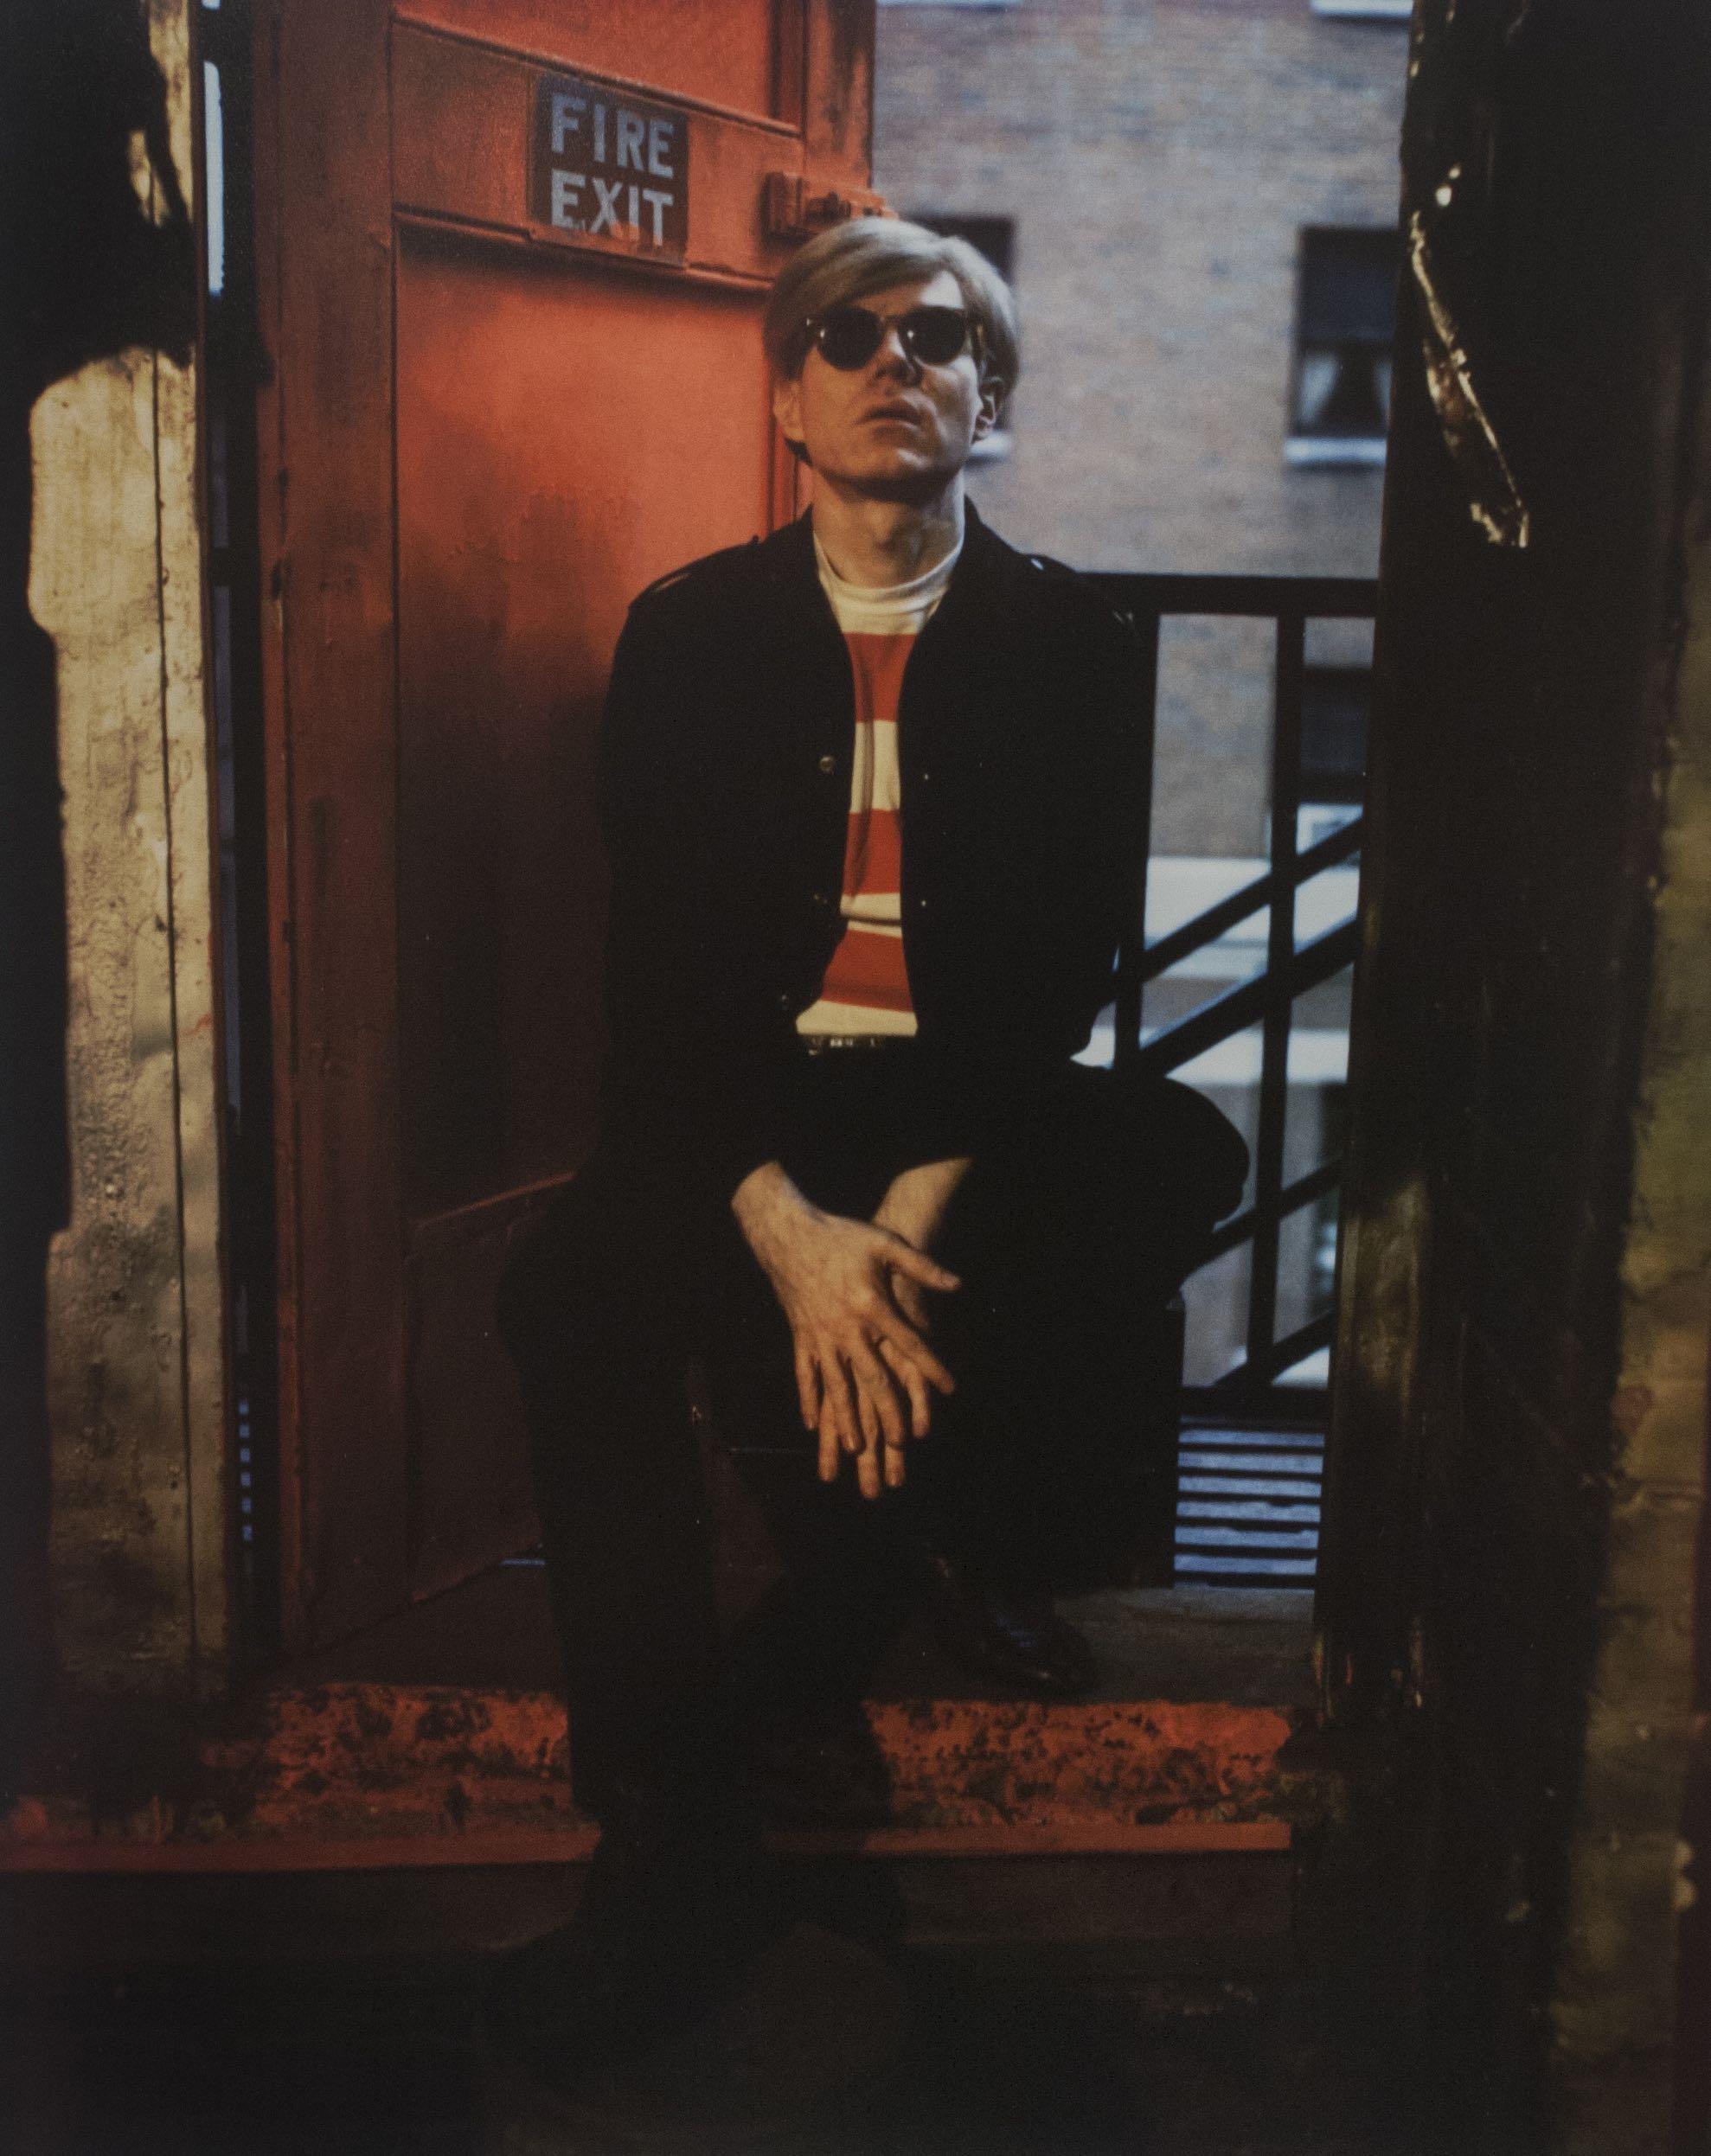 Marie Cosindas, Andy Warhol